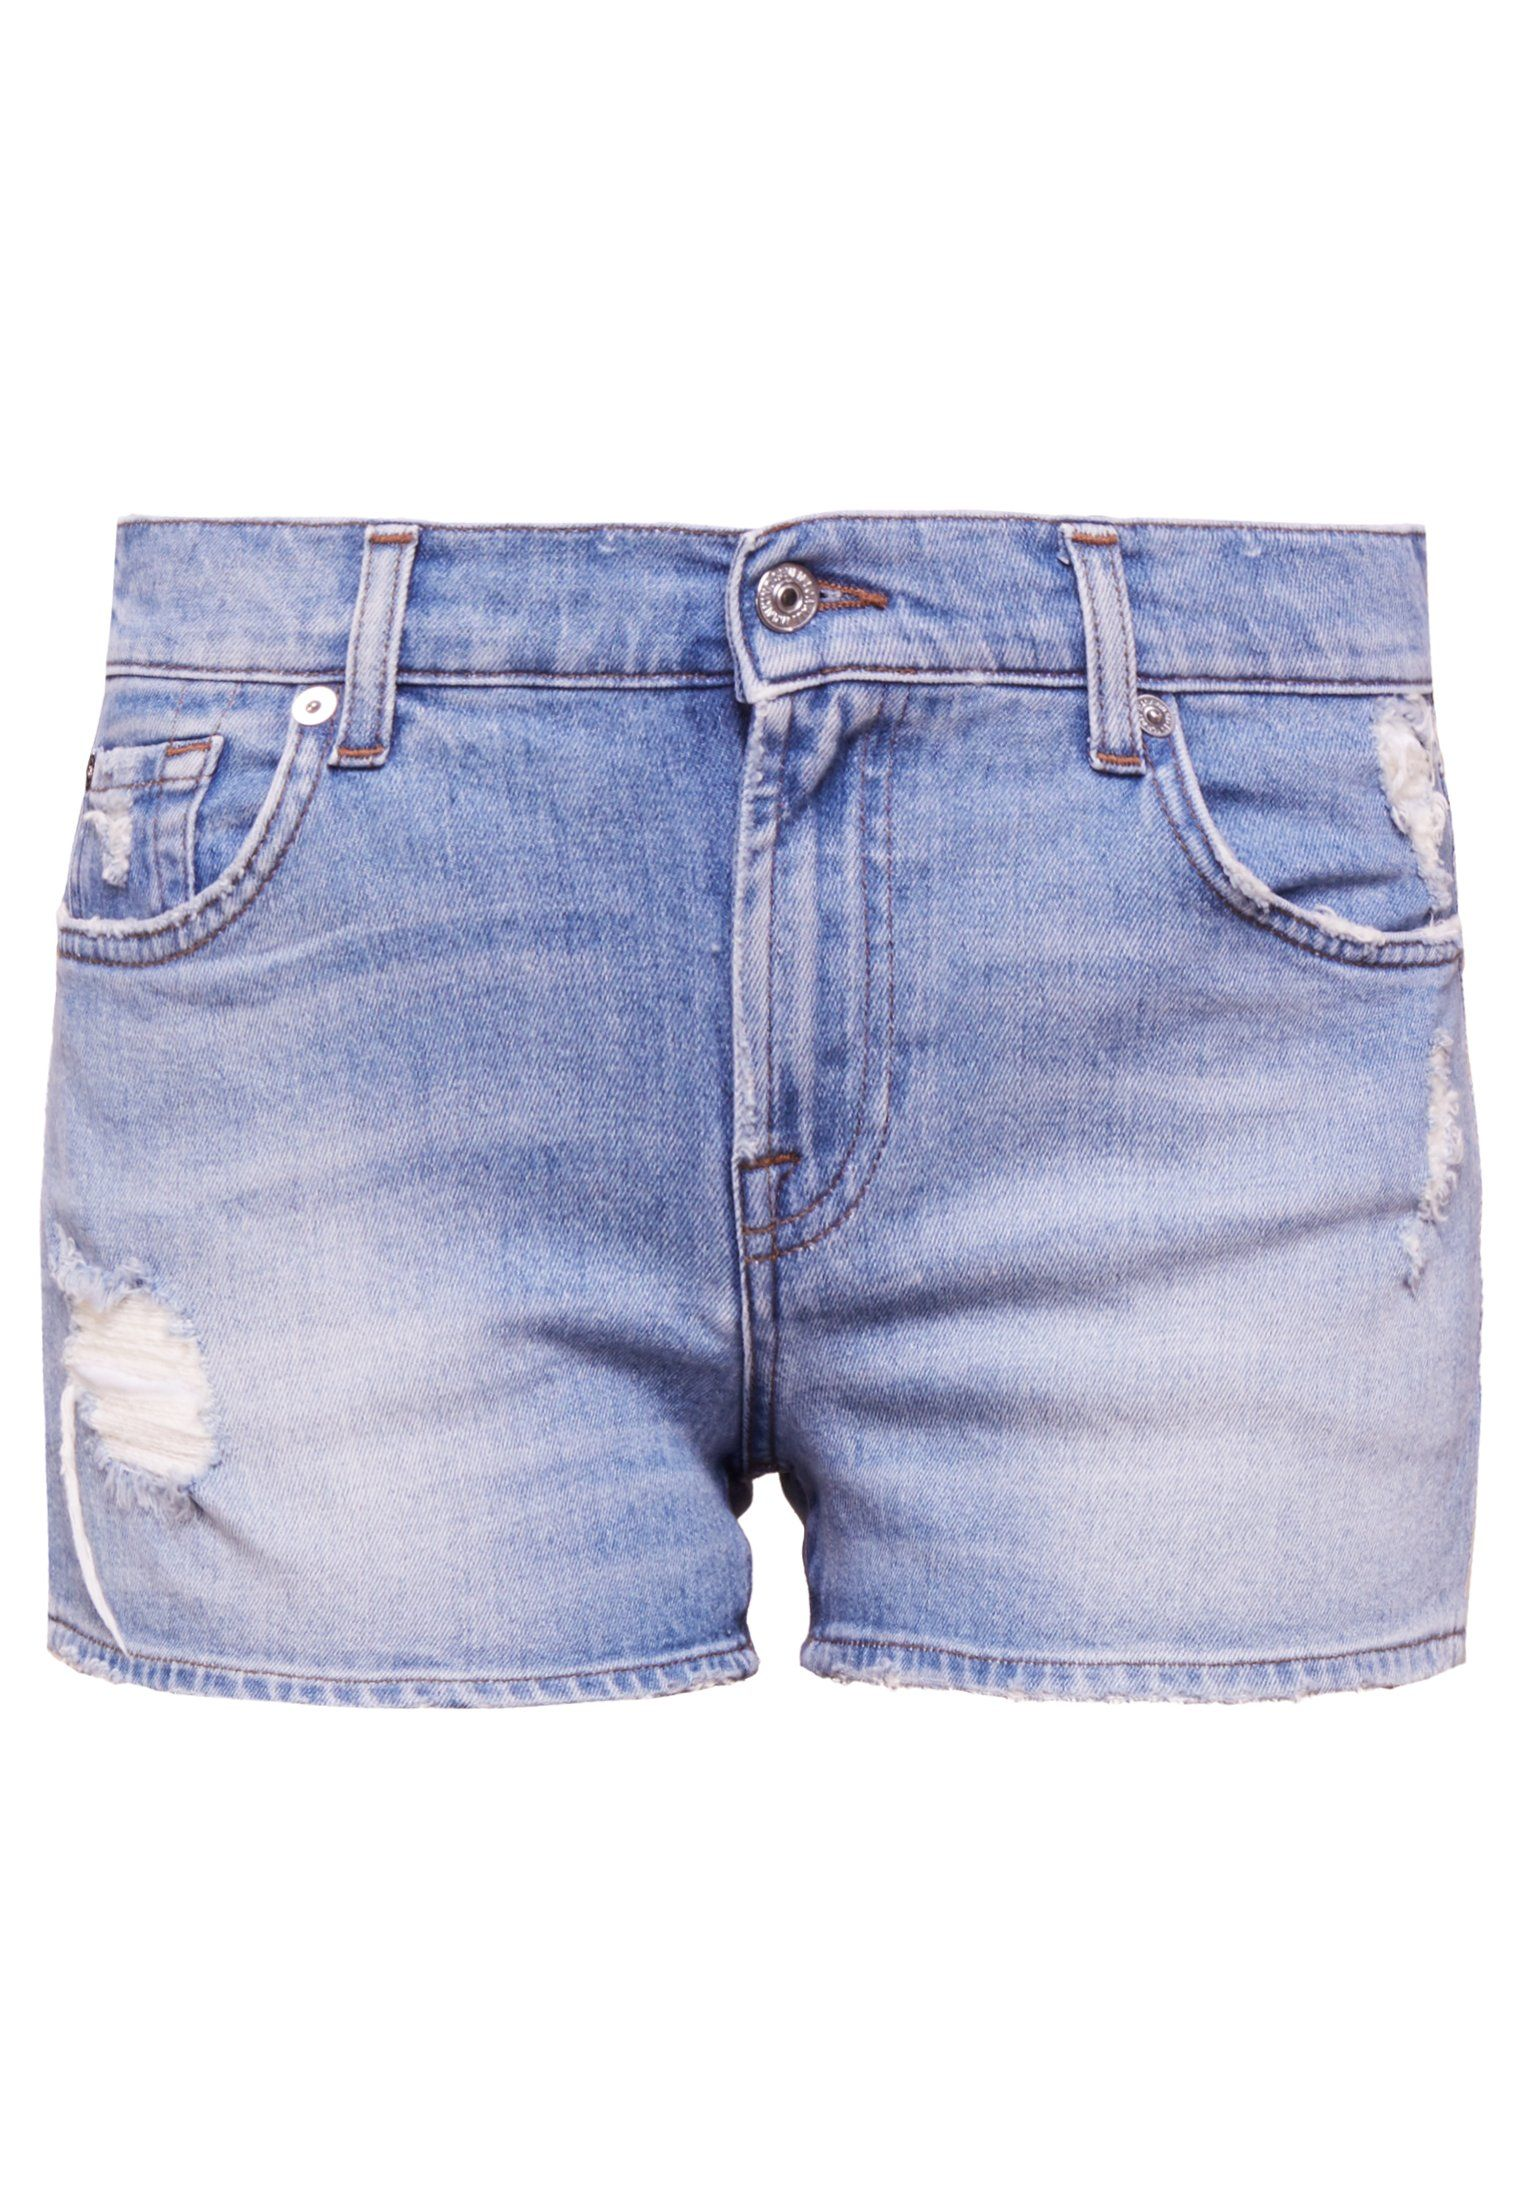 c7bf11b27d43ce Womens Papia Caviar Brown Shorts